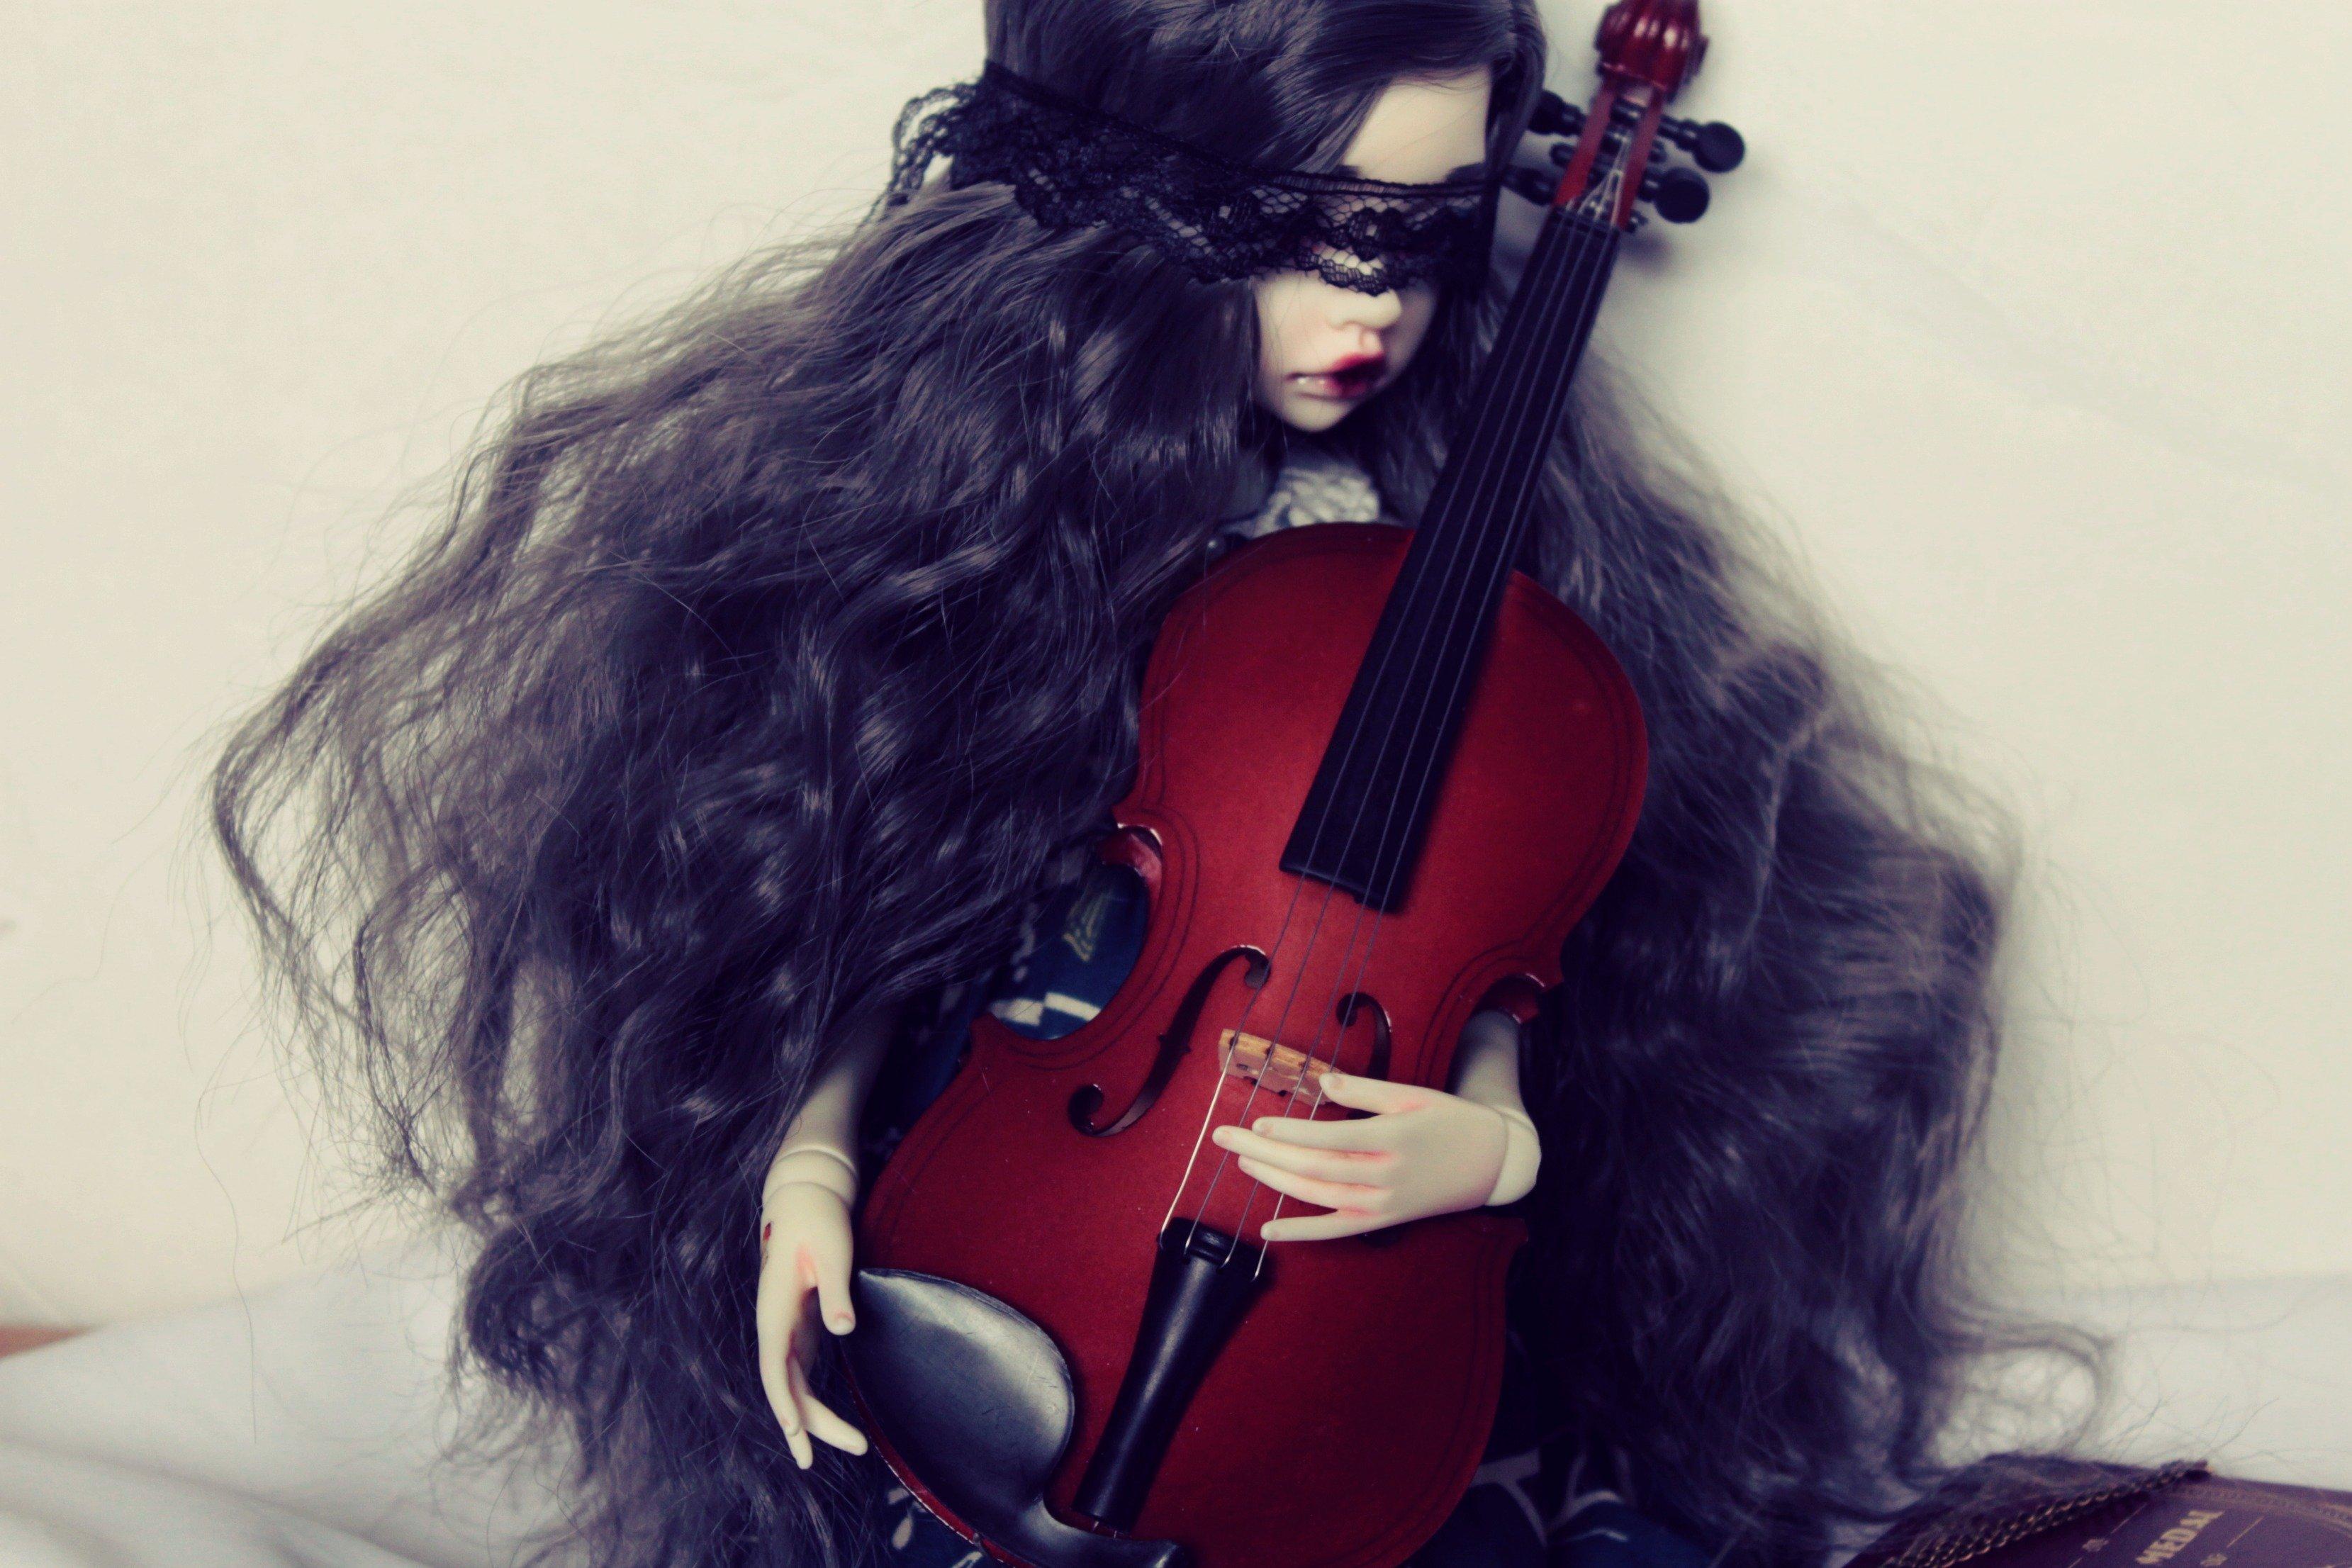 Toys Doll Baby Long Hair Girl Beautiful Cute Violin Wallpaper 3318x2212 783210 Wallpaperup